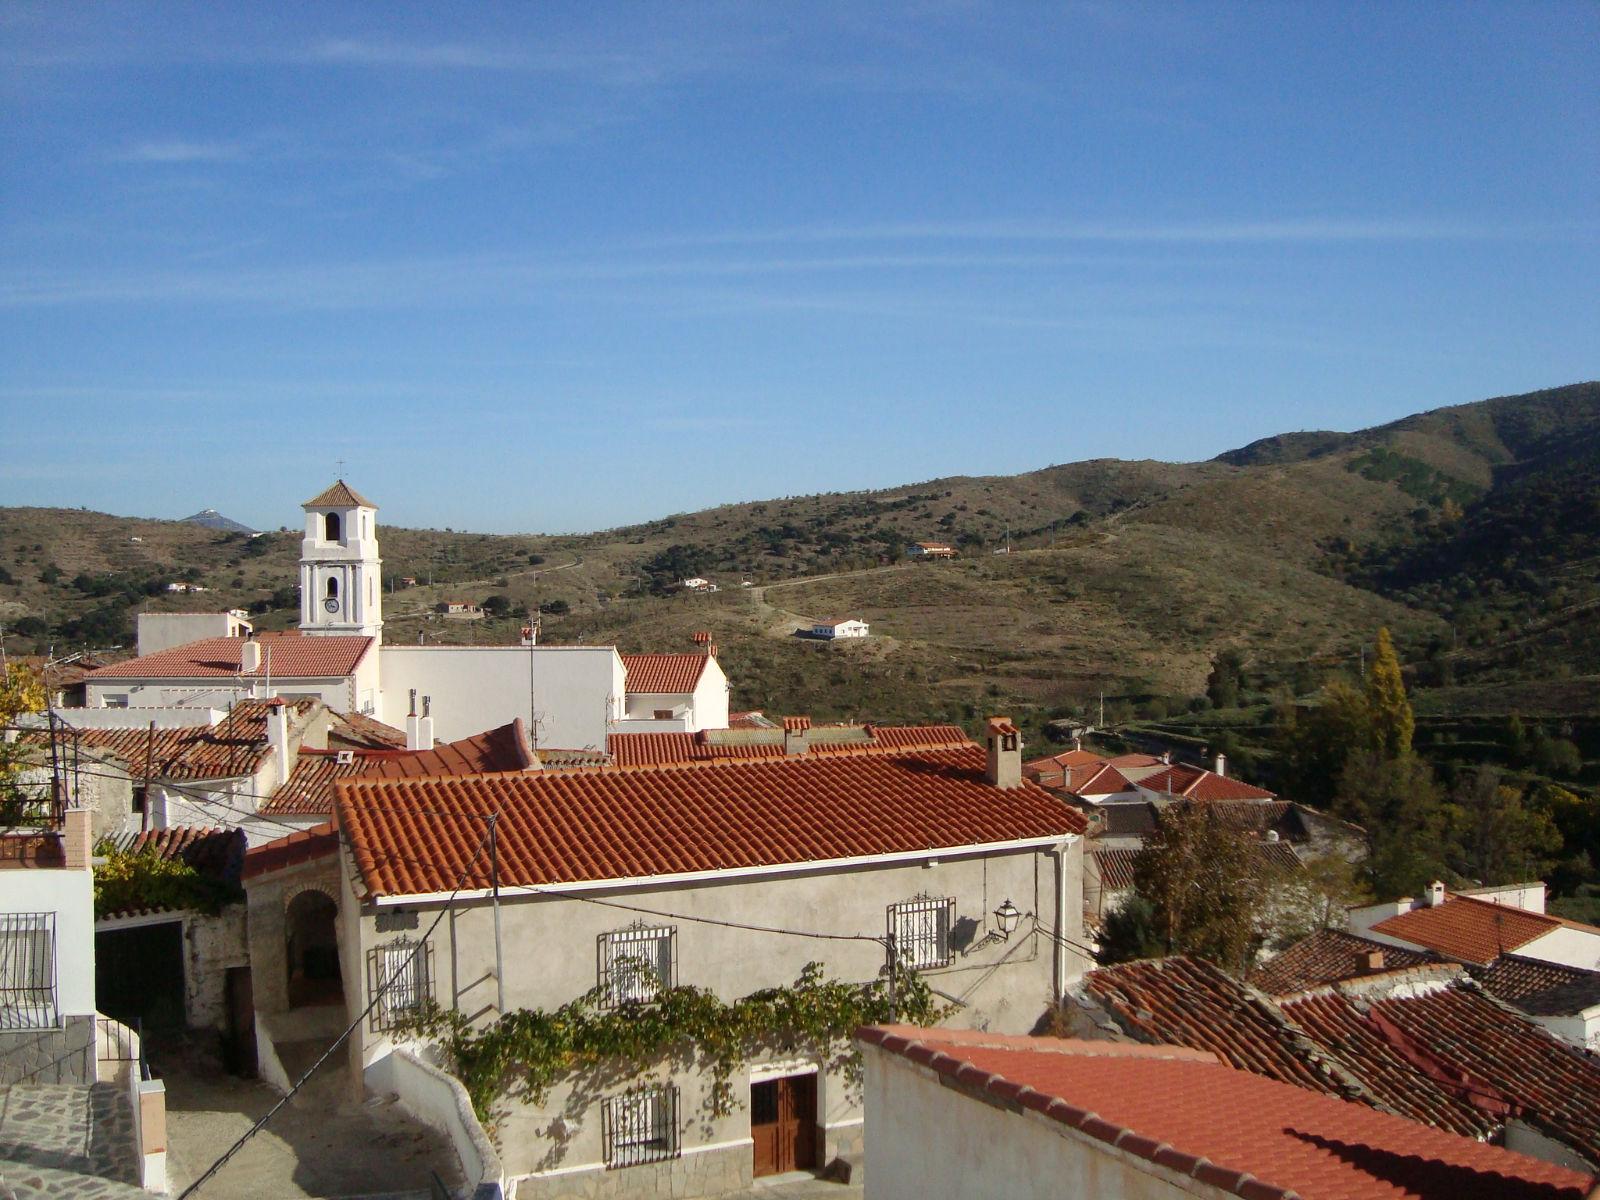 Almeria turistica tahal almeria - Casa rural tahal ...